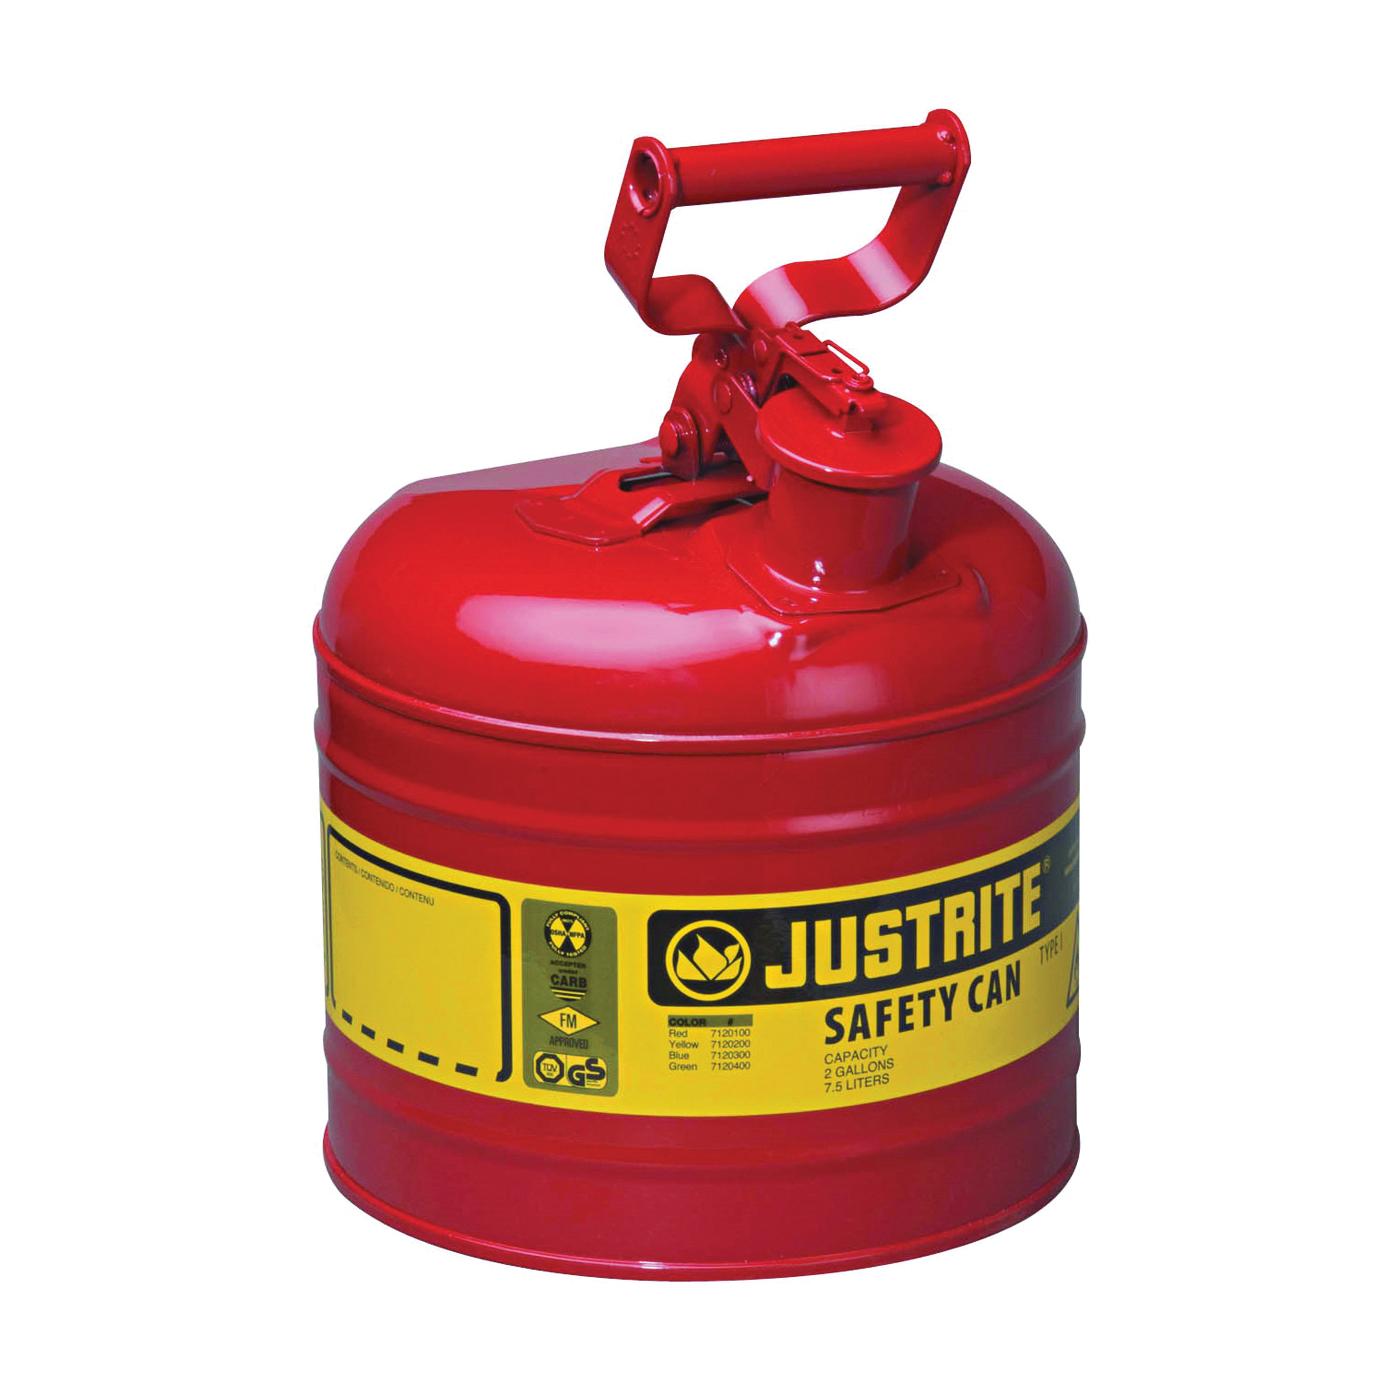 JUSTRITE 7120100